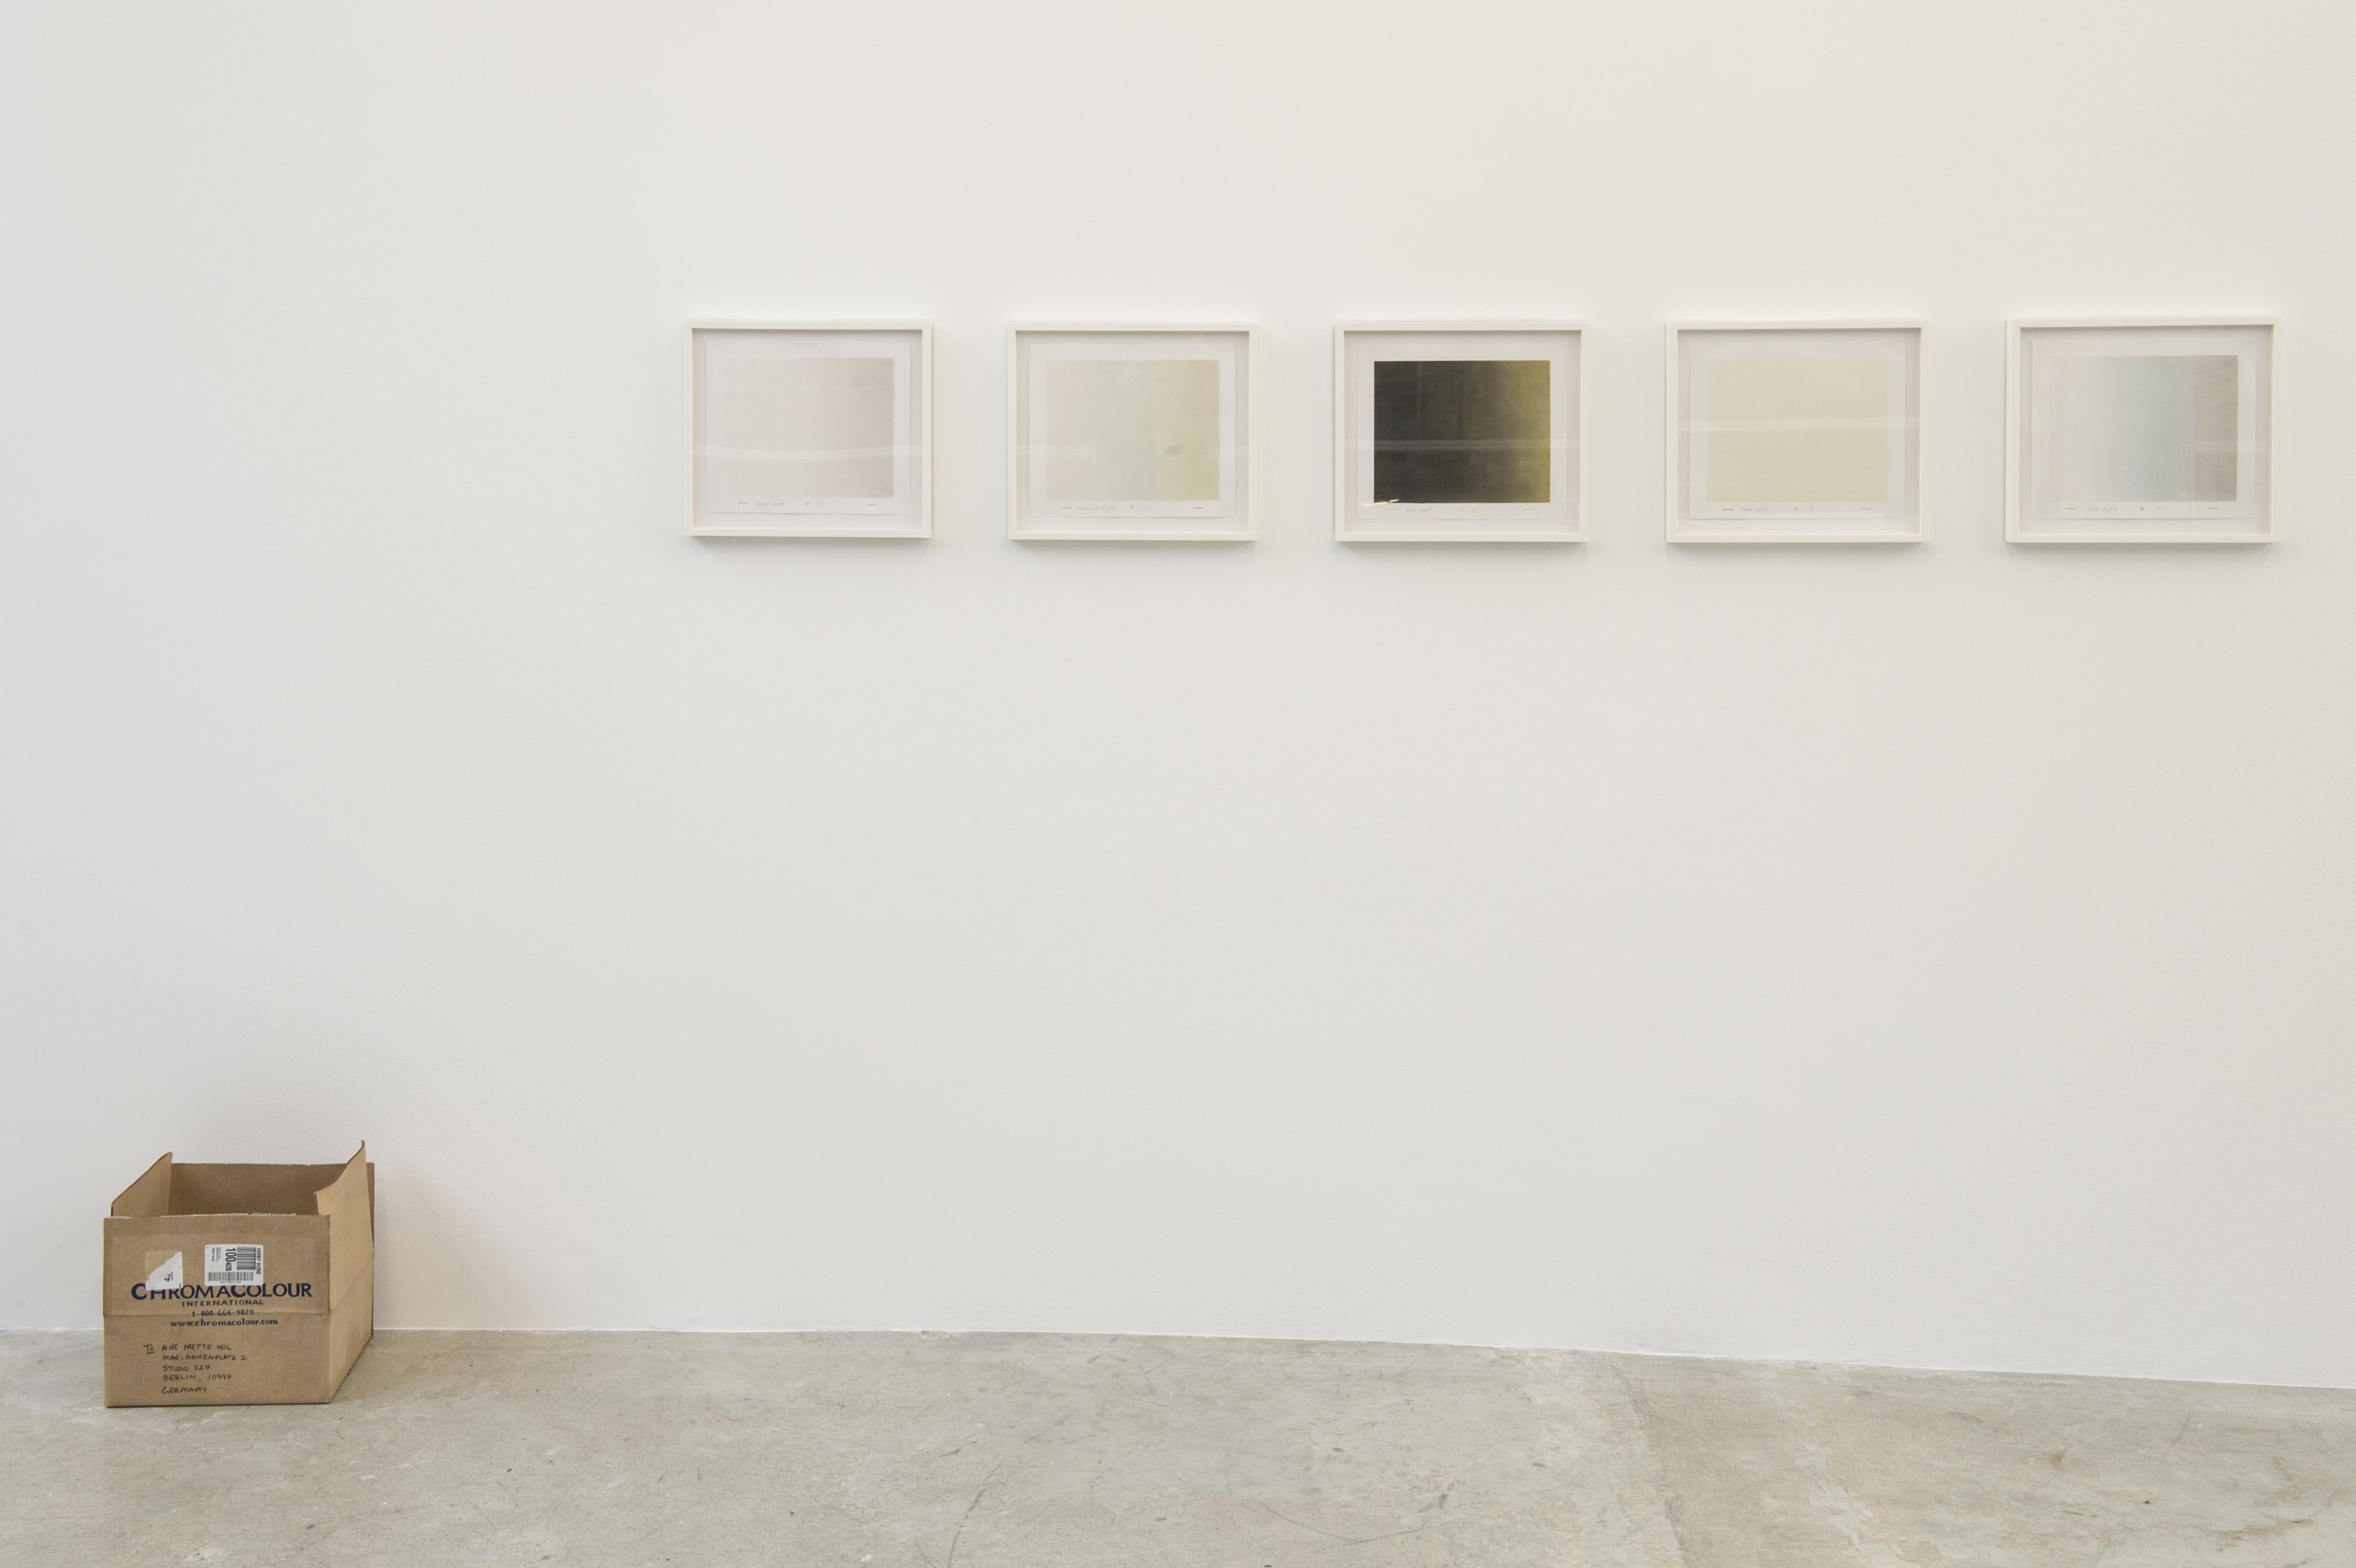 vue-dexposition-10-in-the-echoes-credit-la-kunsthalle-mulhouse-photo-seb-bozon